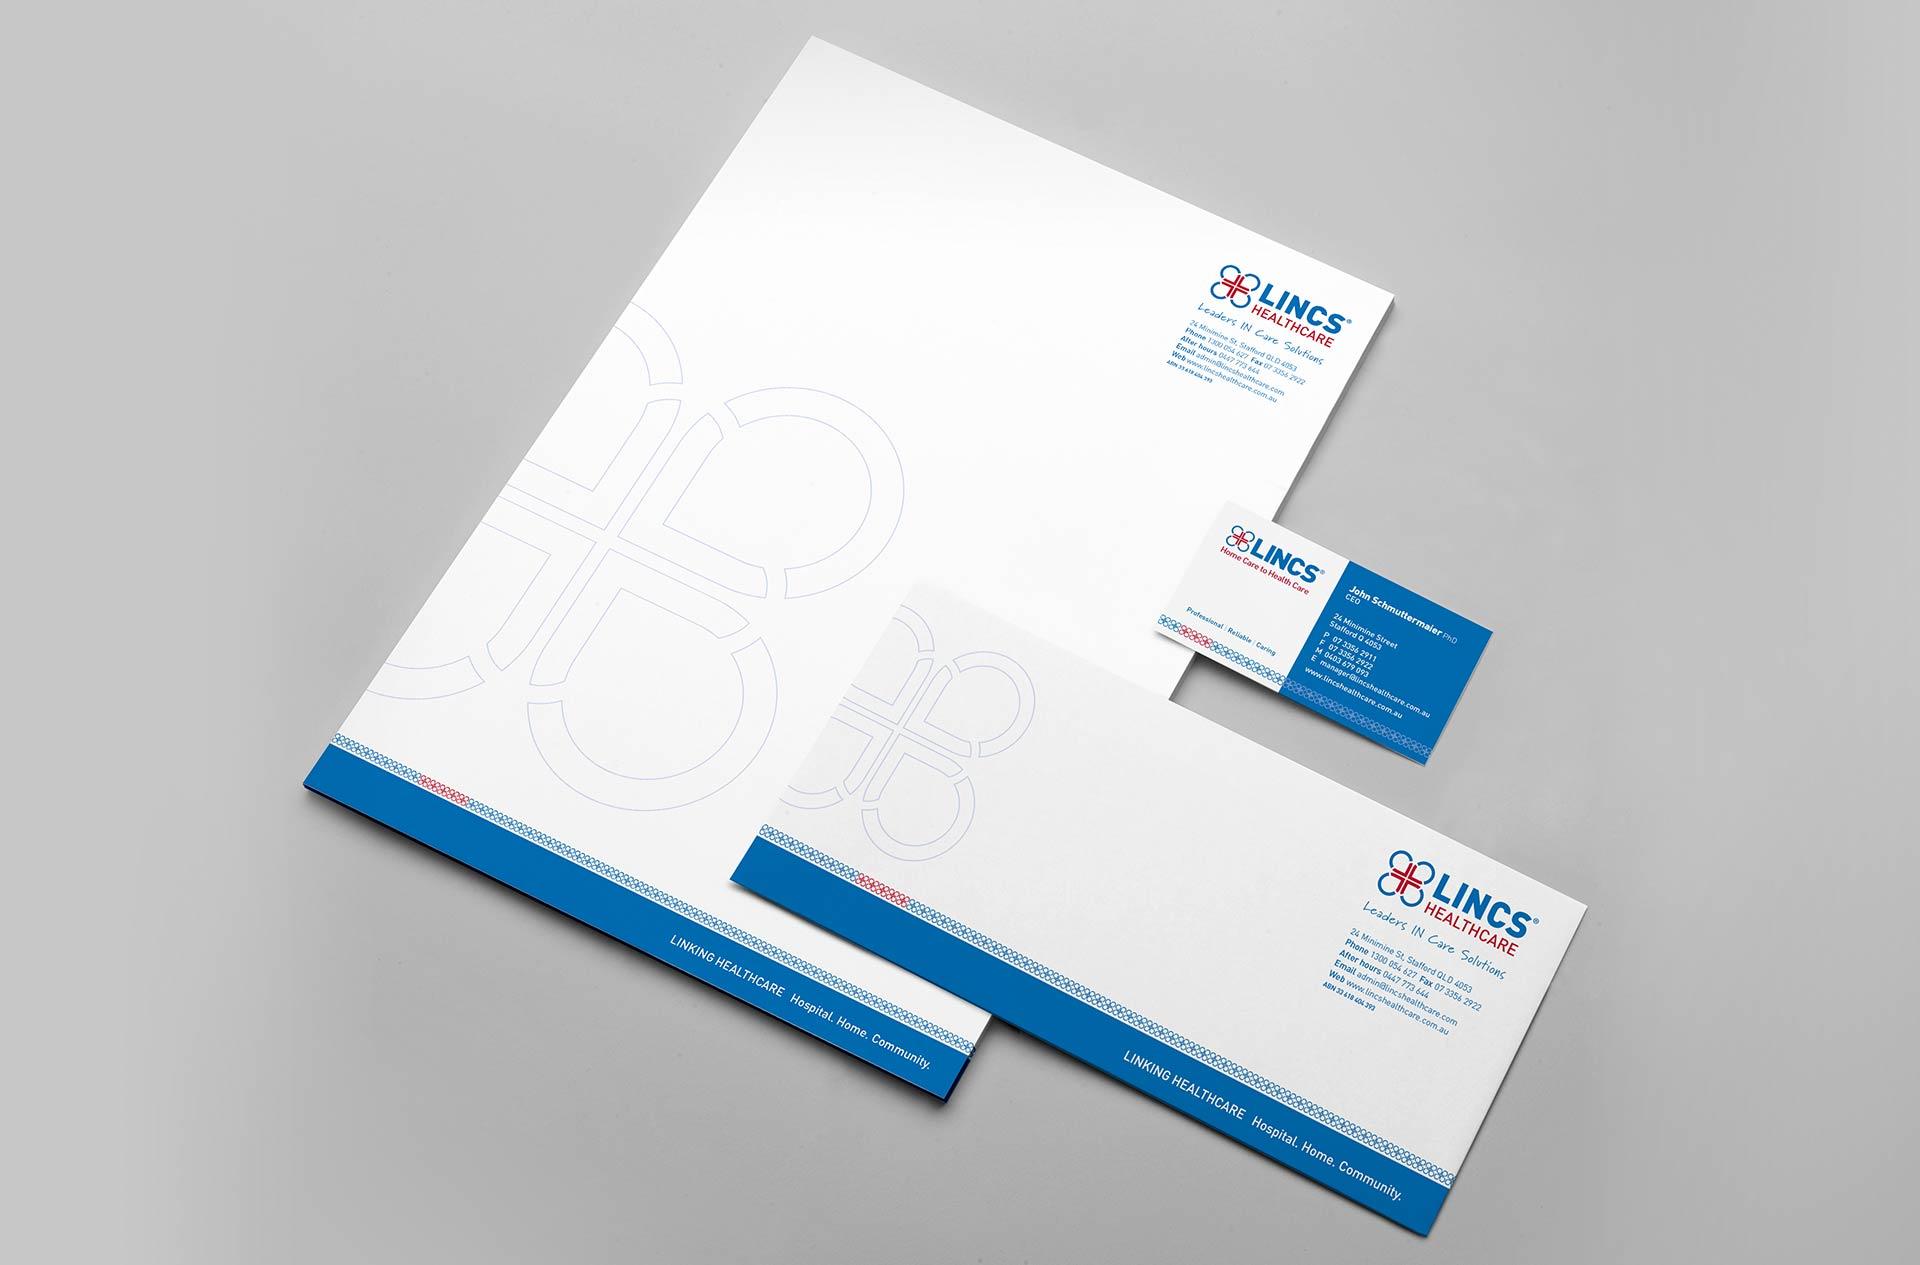 LINCS Stationery Design